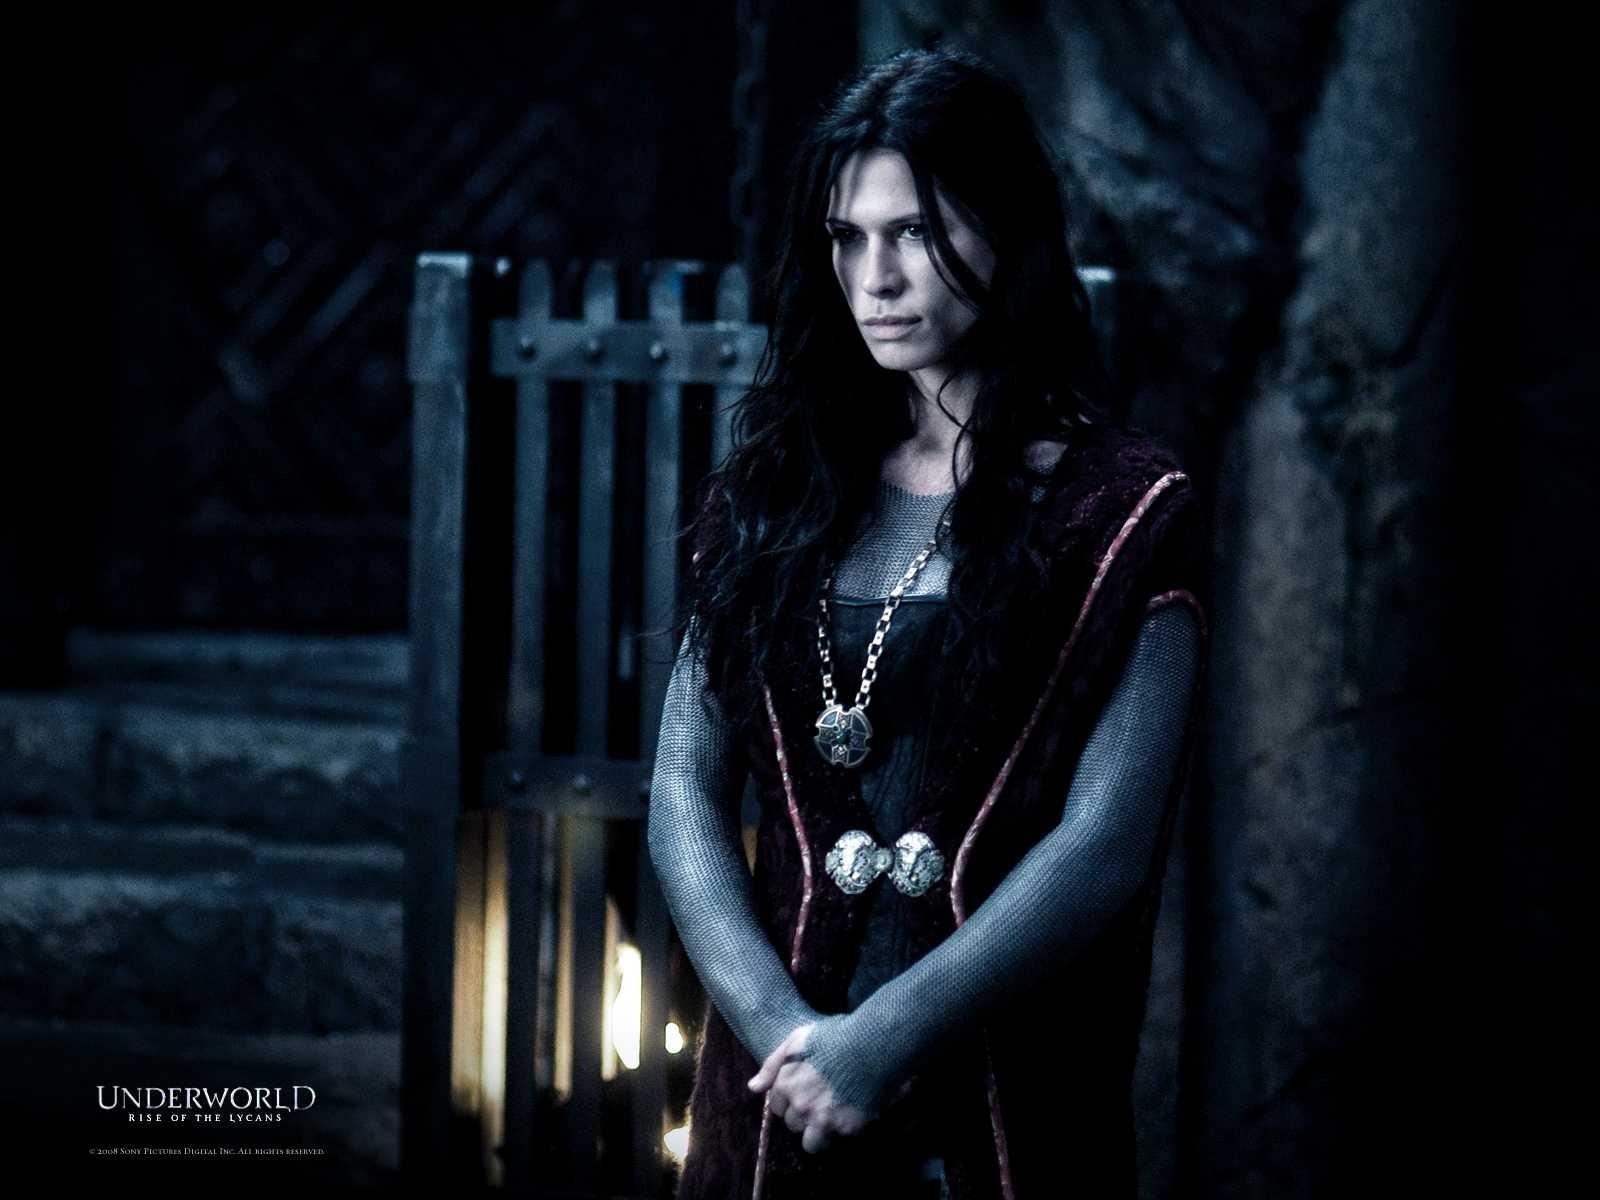 Un wallpaper del film Underworld: La ribellione dei Lycans con Rhona Mitra